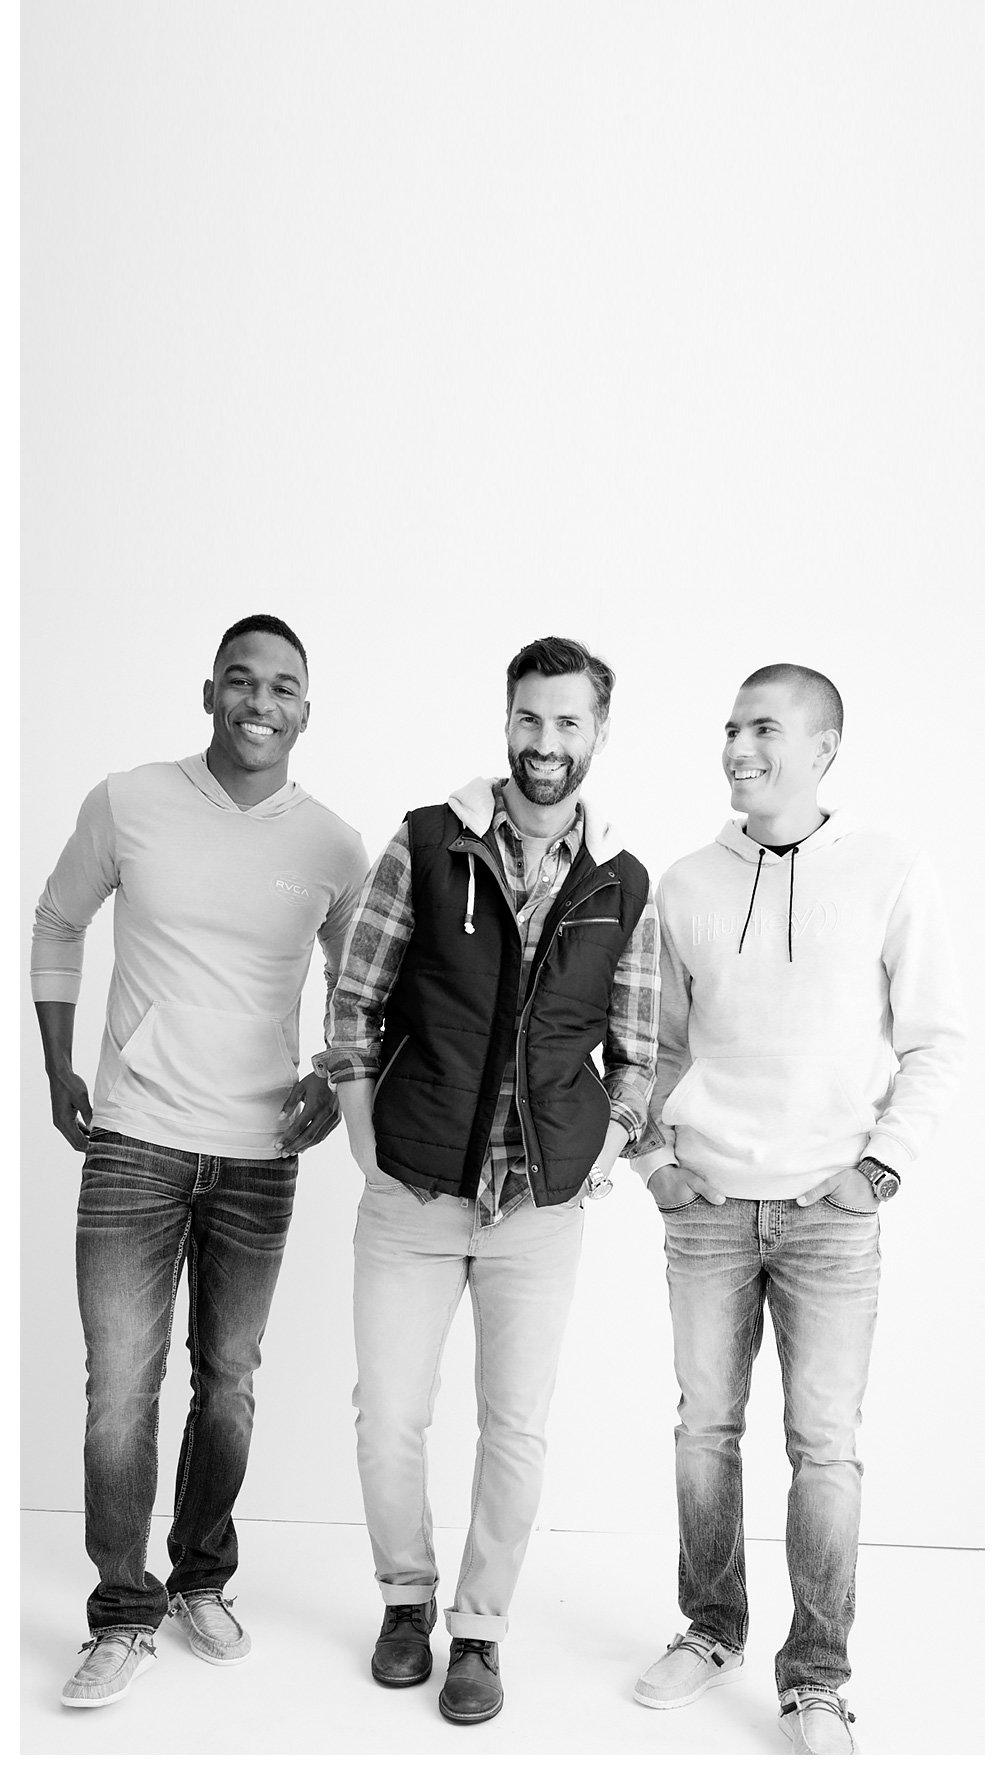 Men's Clothing & Apparel | Buckle